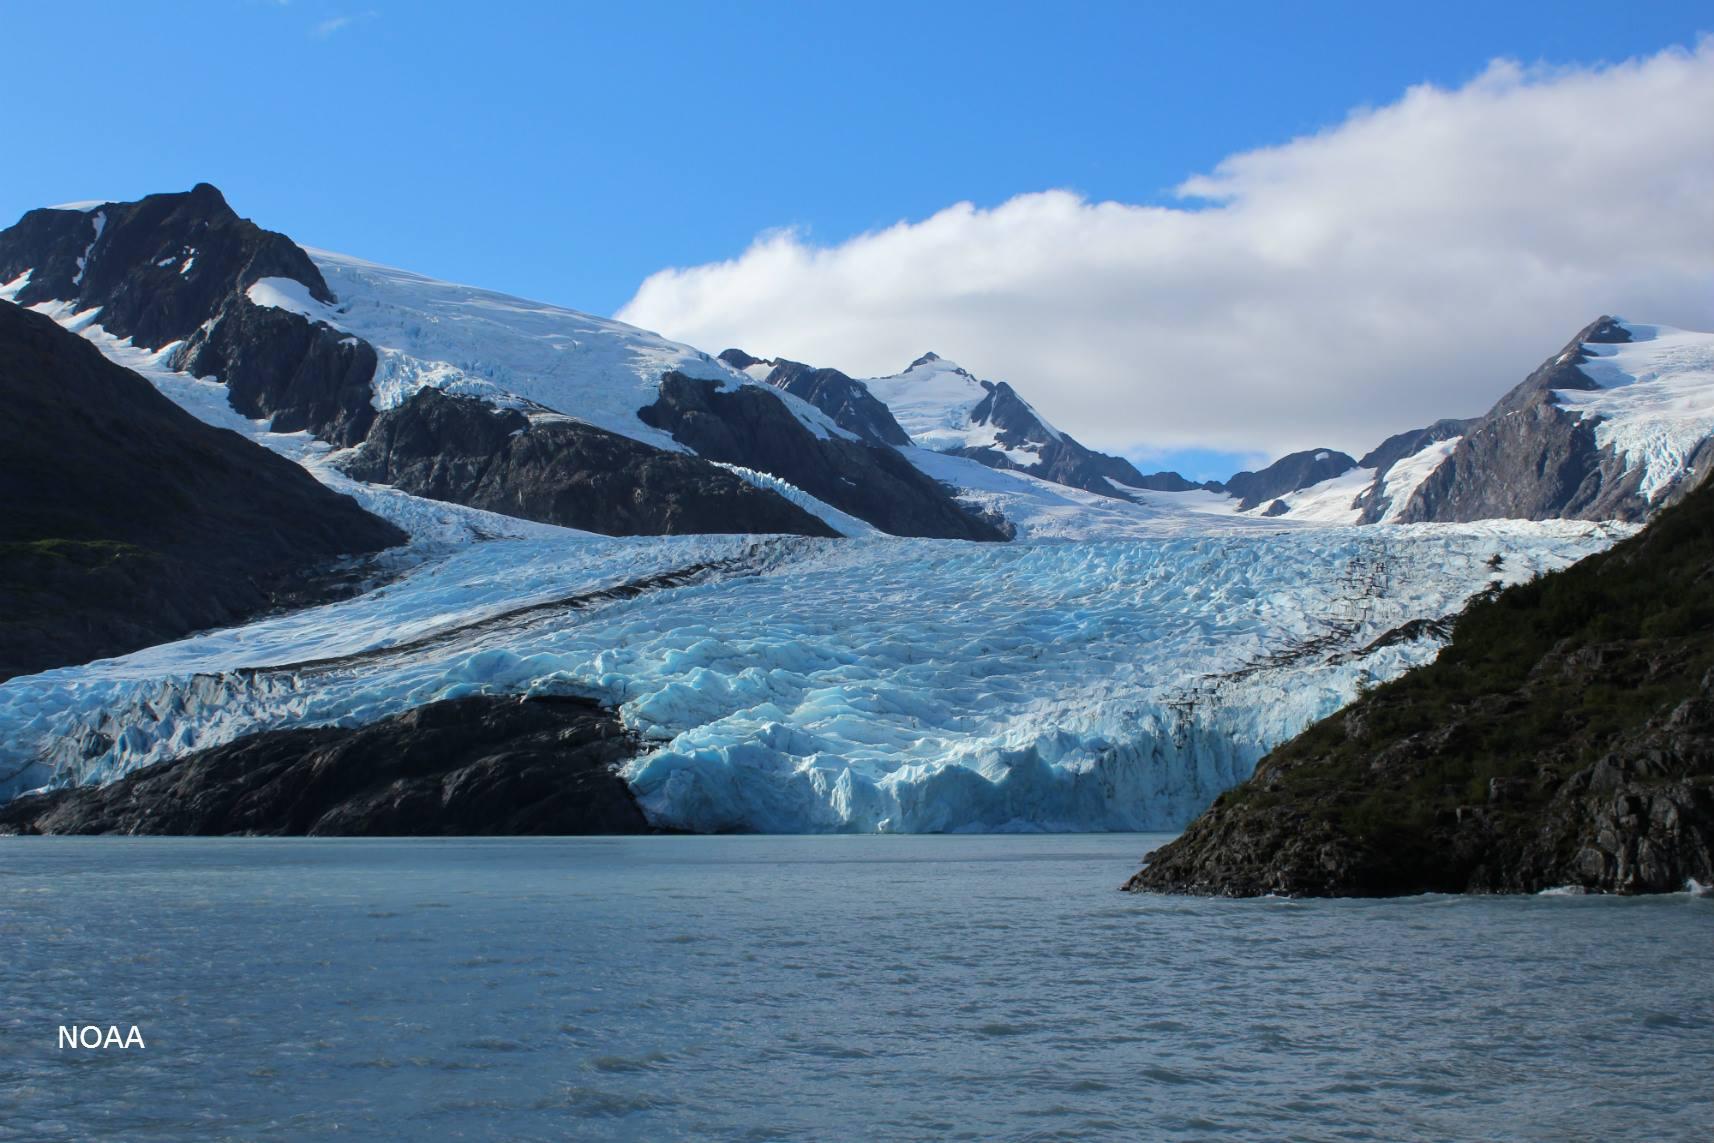 Portage Glacier - Alaska | Alaska glaciers, Natural